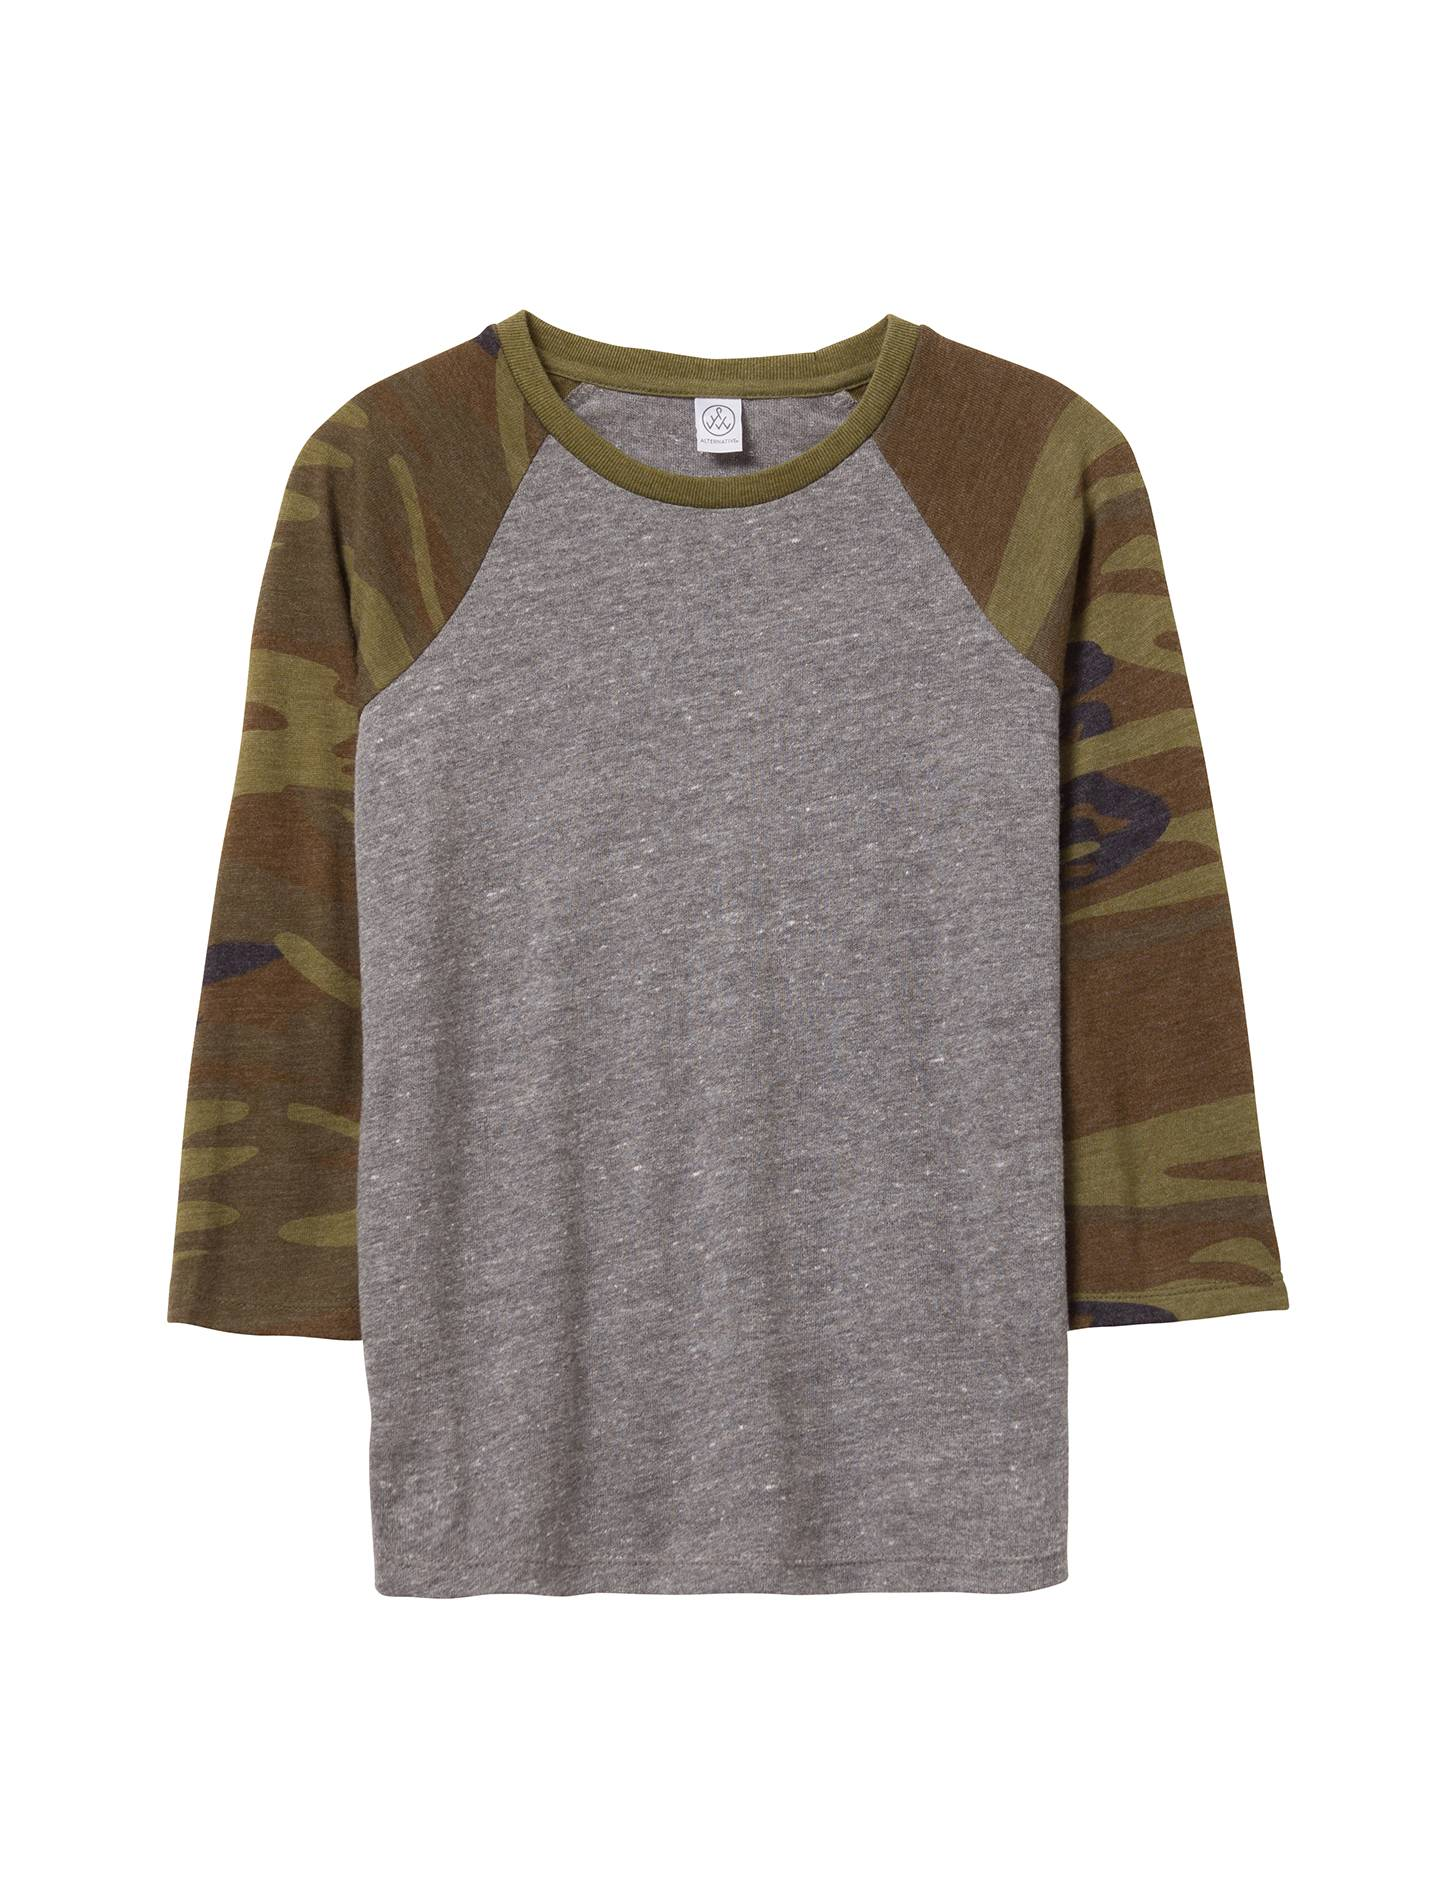 Alternative Apparel Baseball Printed Eco-Jersey Youth T-Shirt - Eco Grey & Camouflage Green - Size: YXL